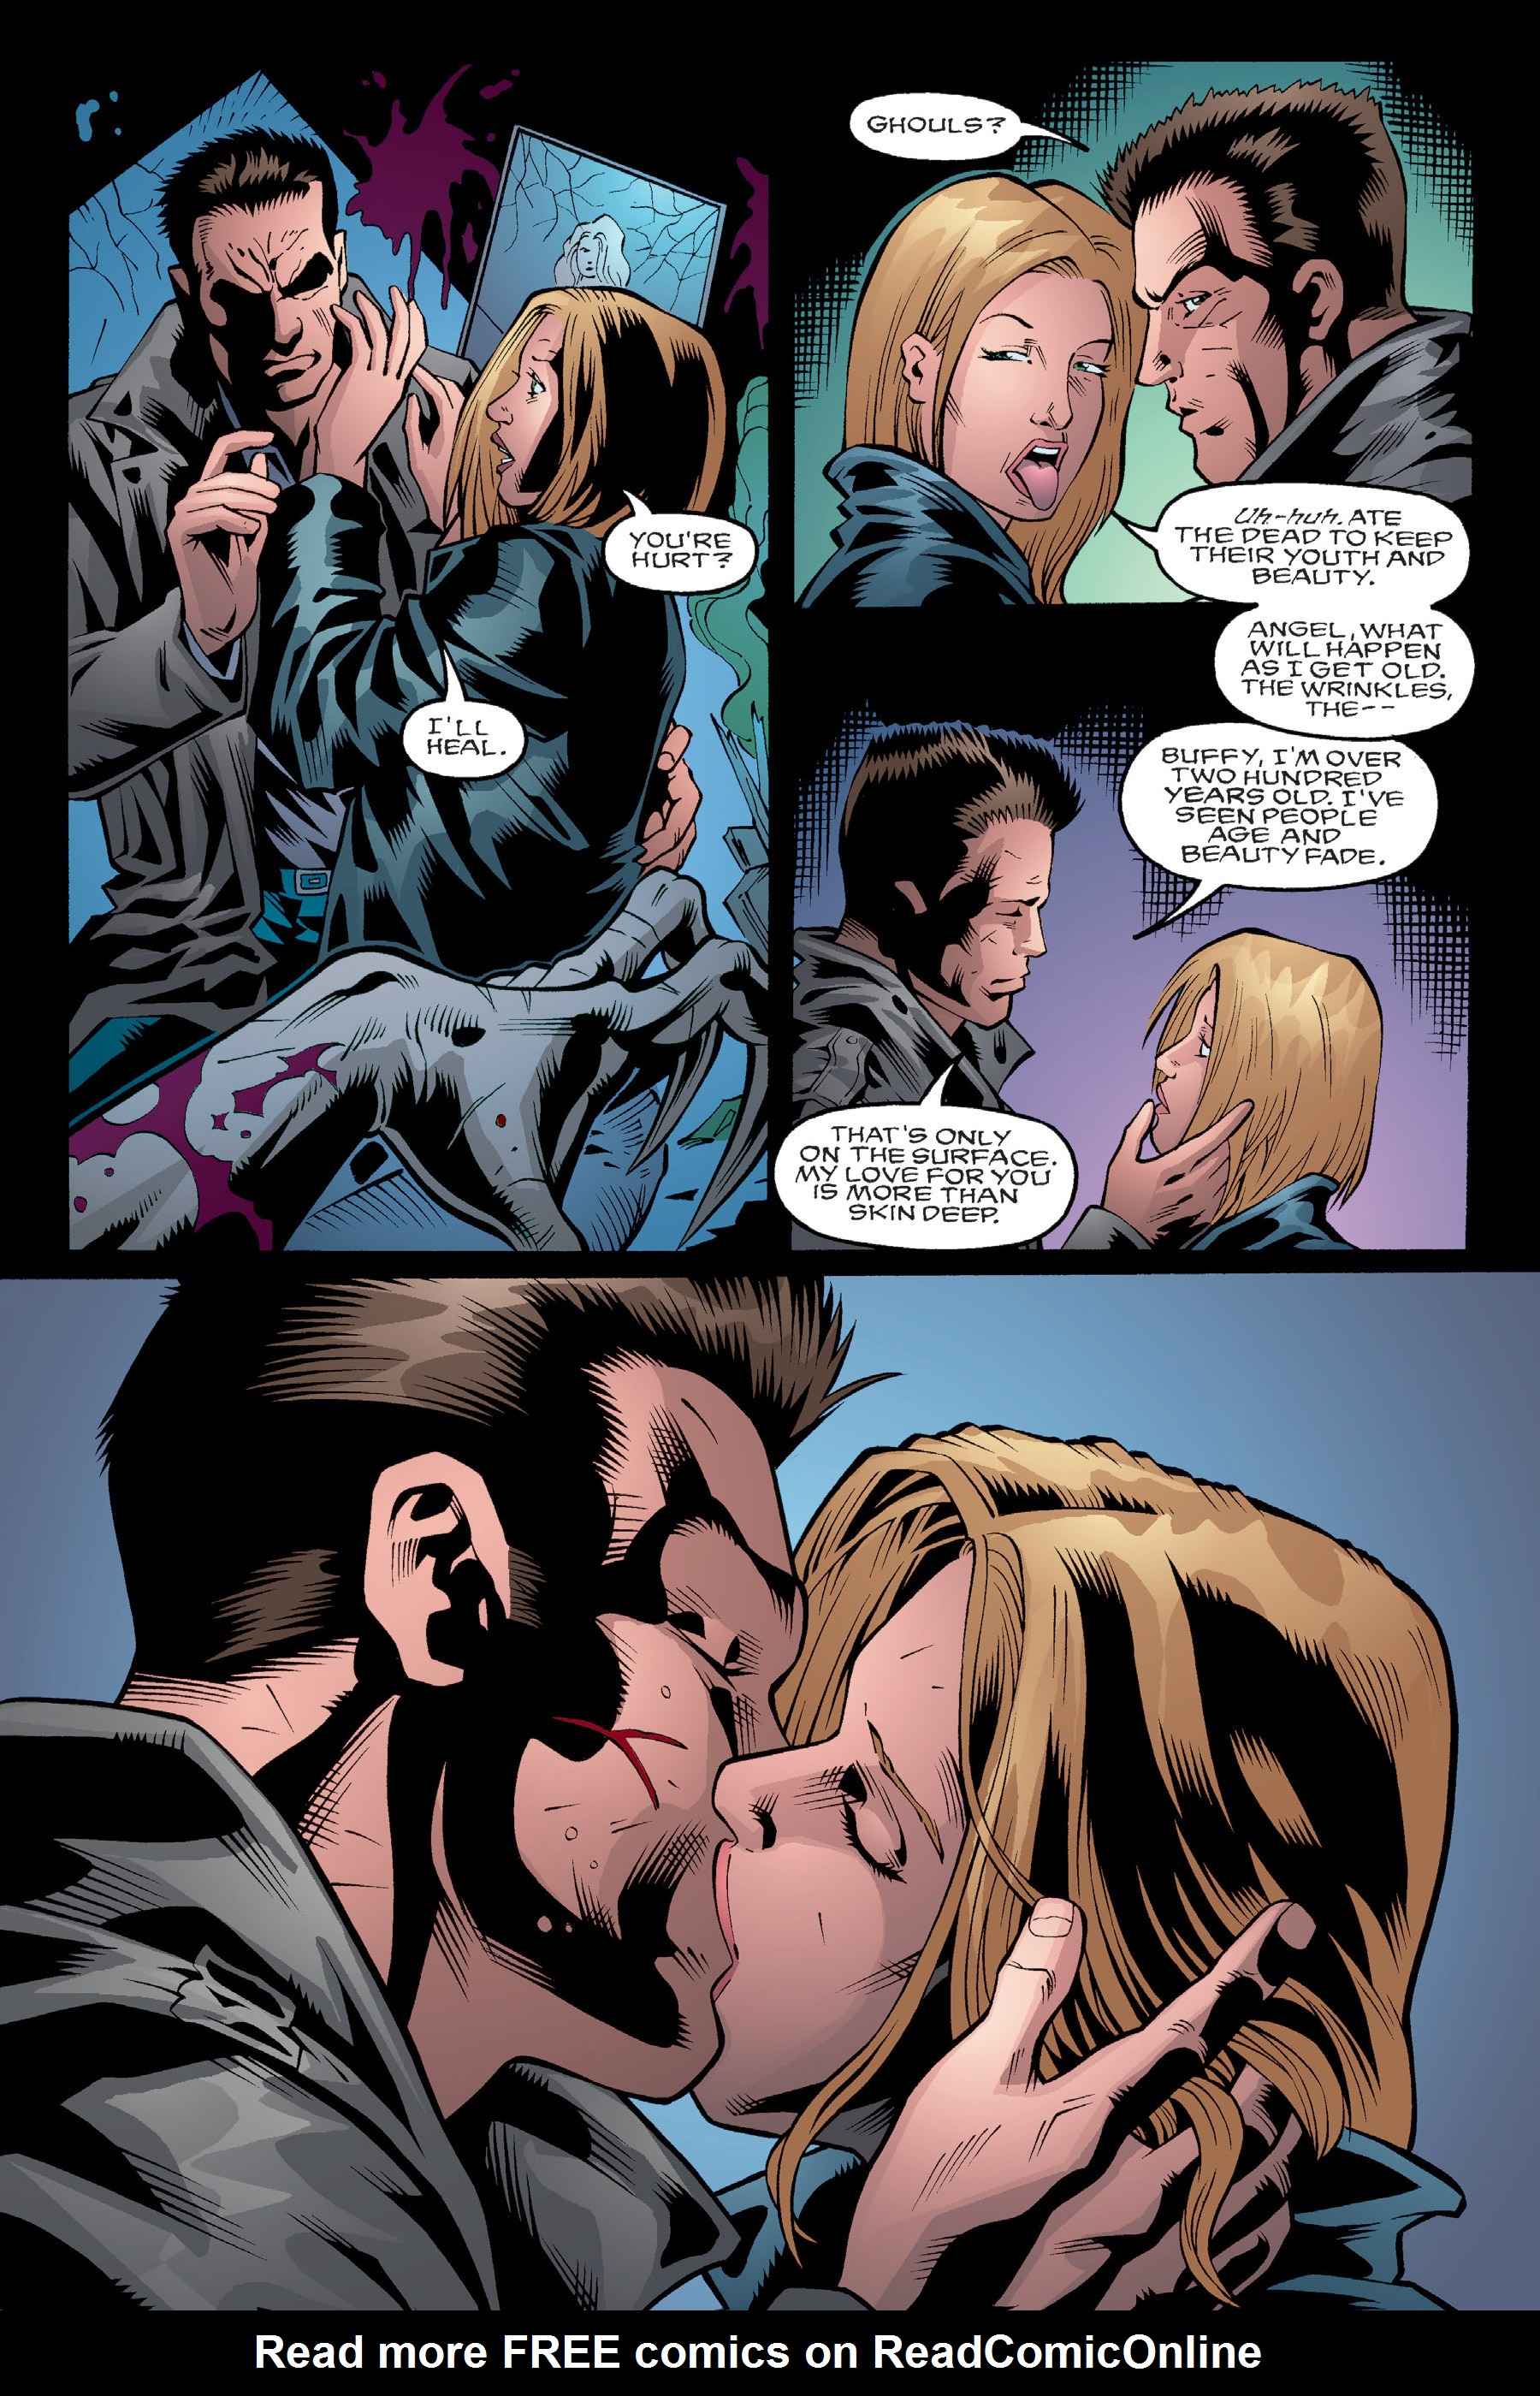 Read online Buffy the Vampire Slayer: Omnibus comic -  Issue # TPB 4 - 52